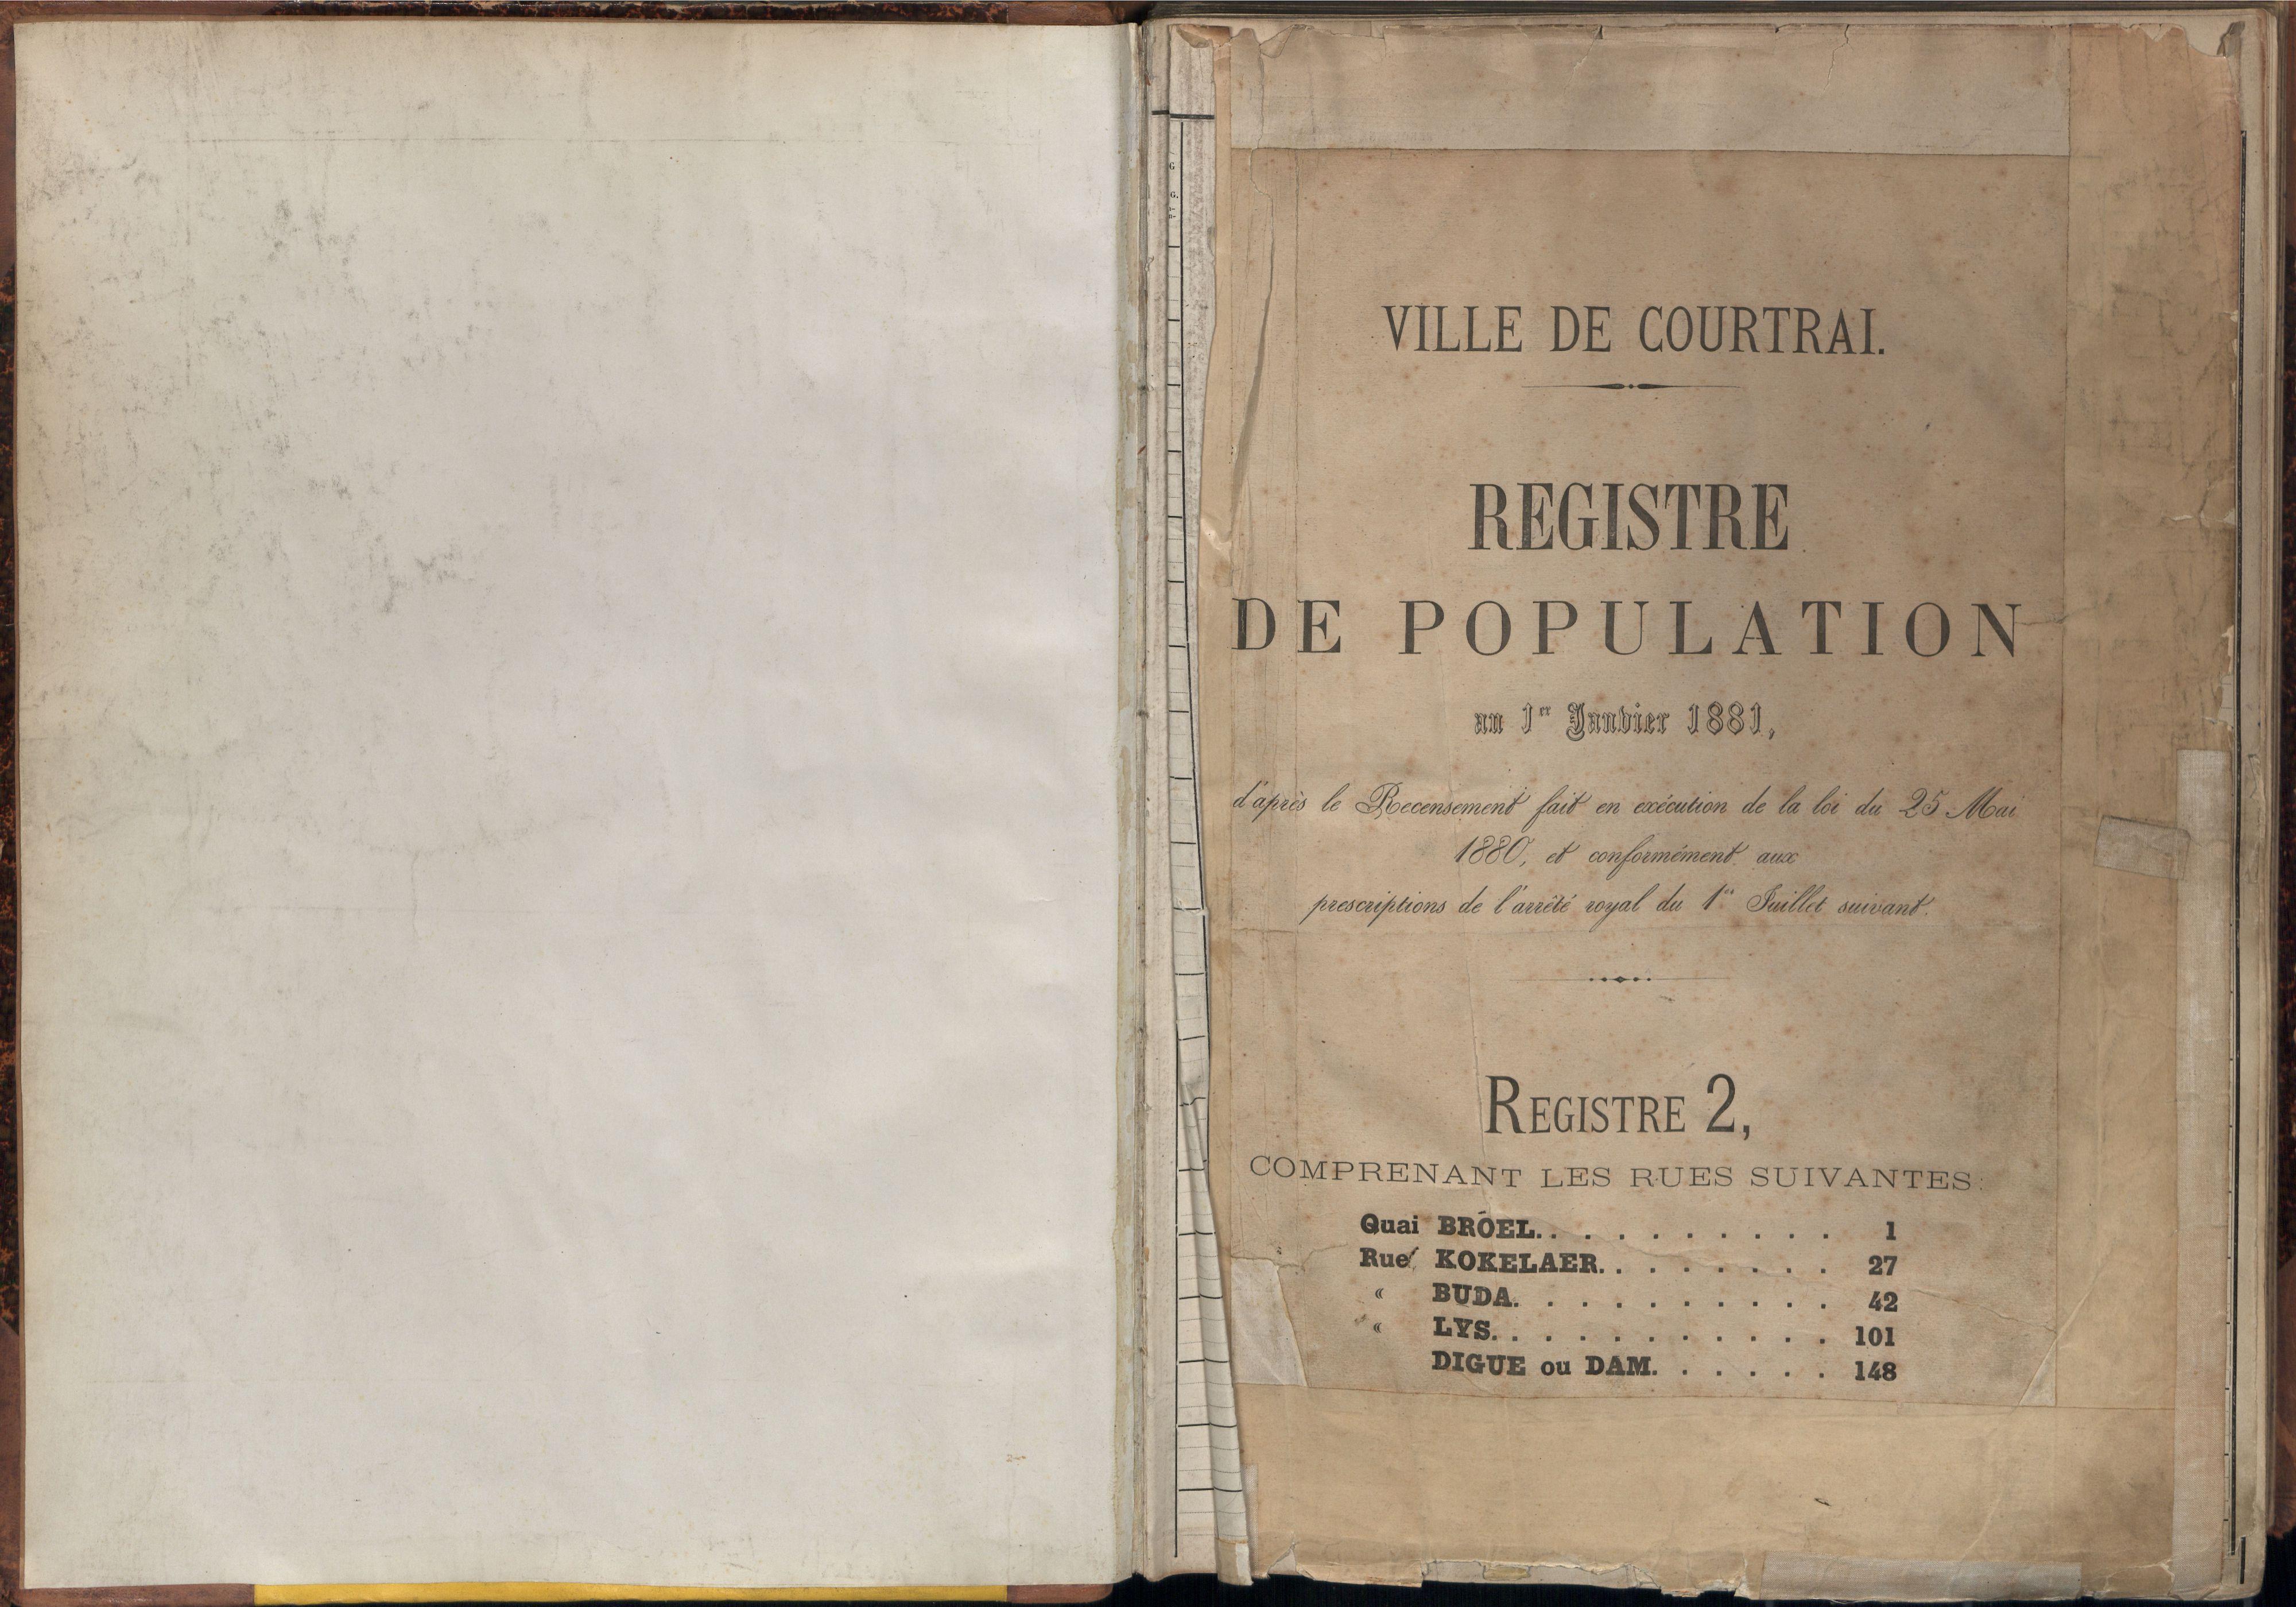 Bevolkingsregister Kortrijk 1880 boek 2